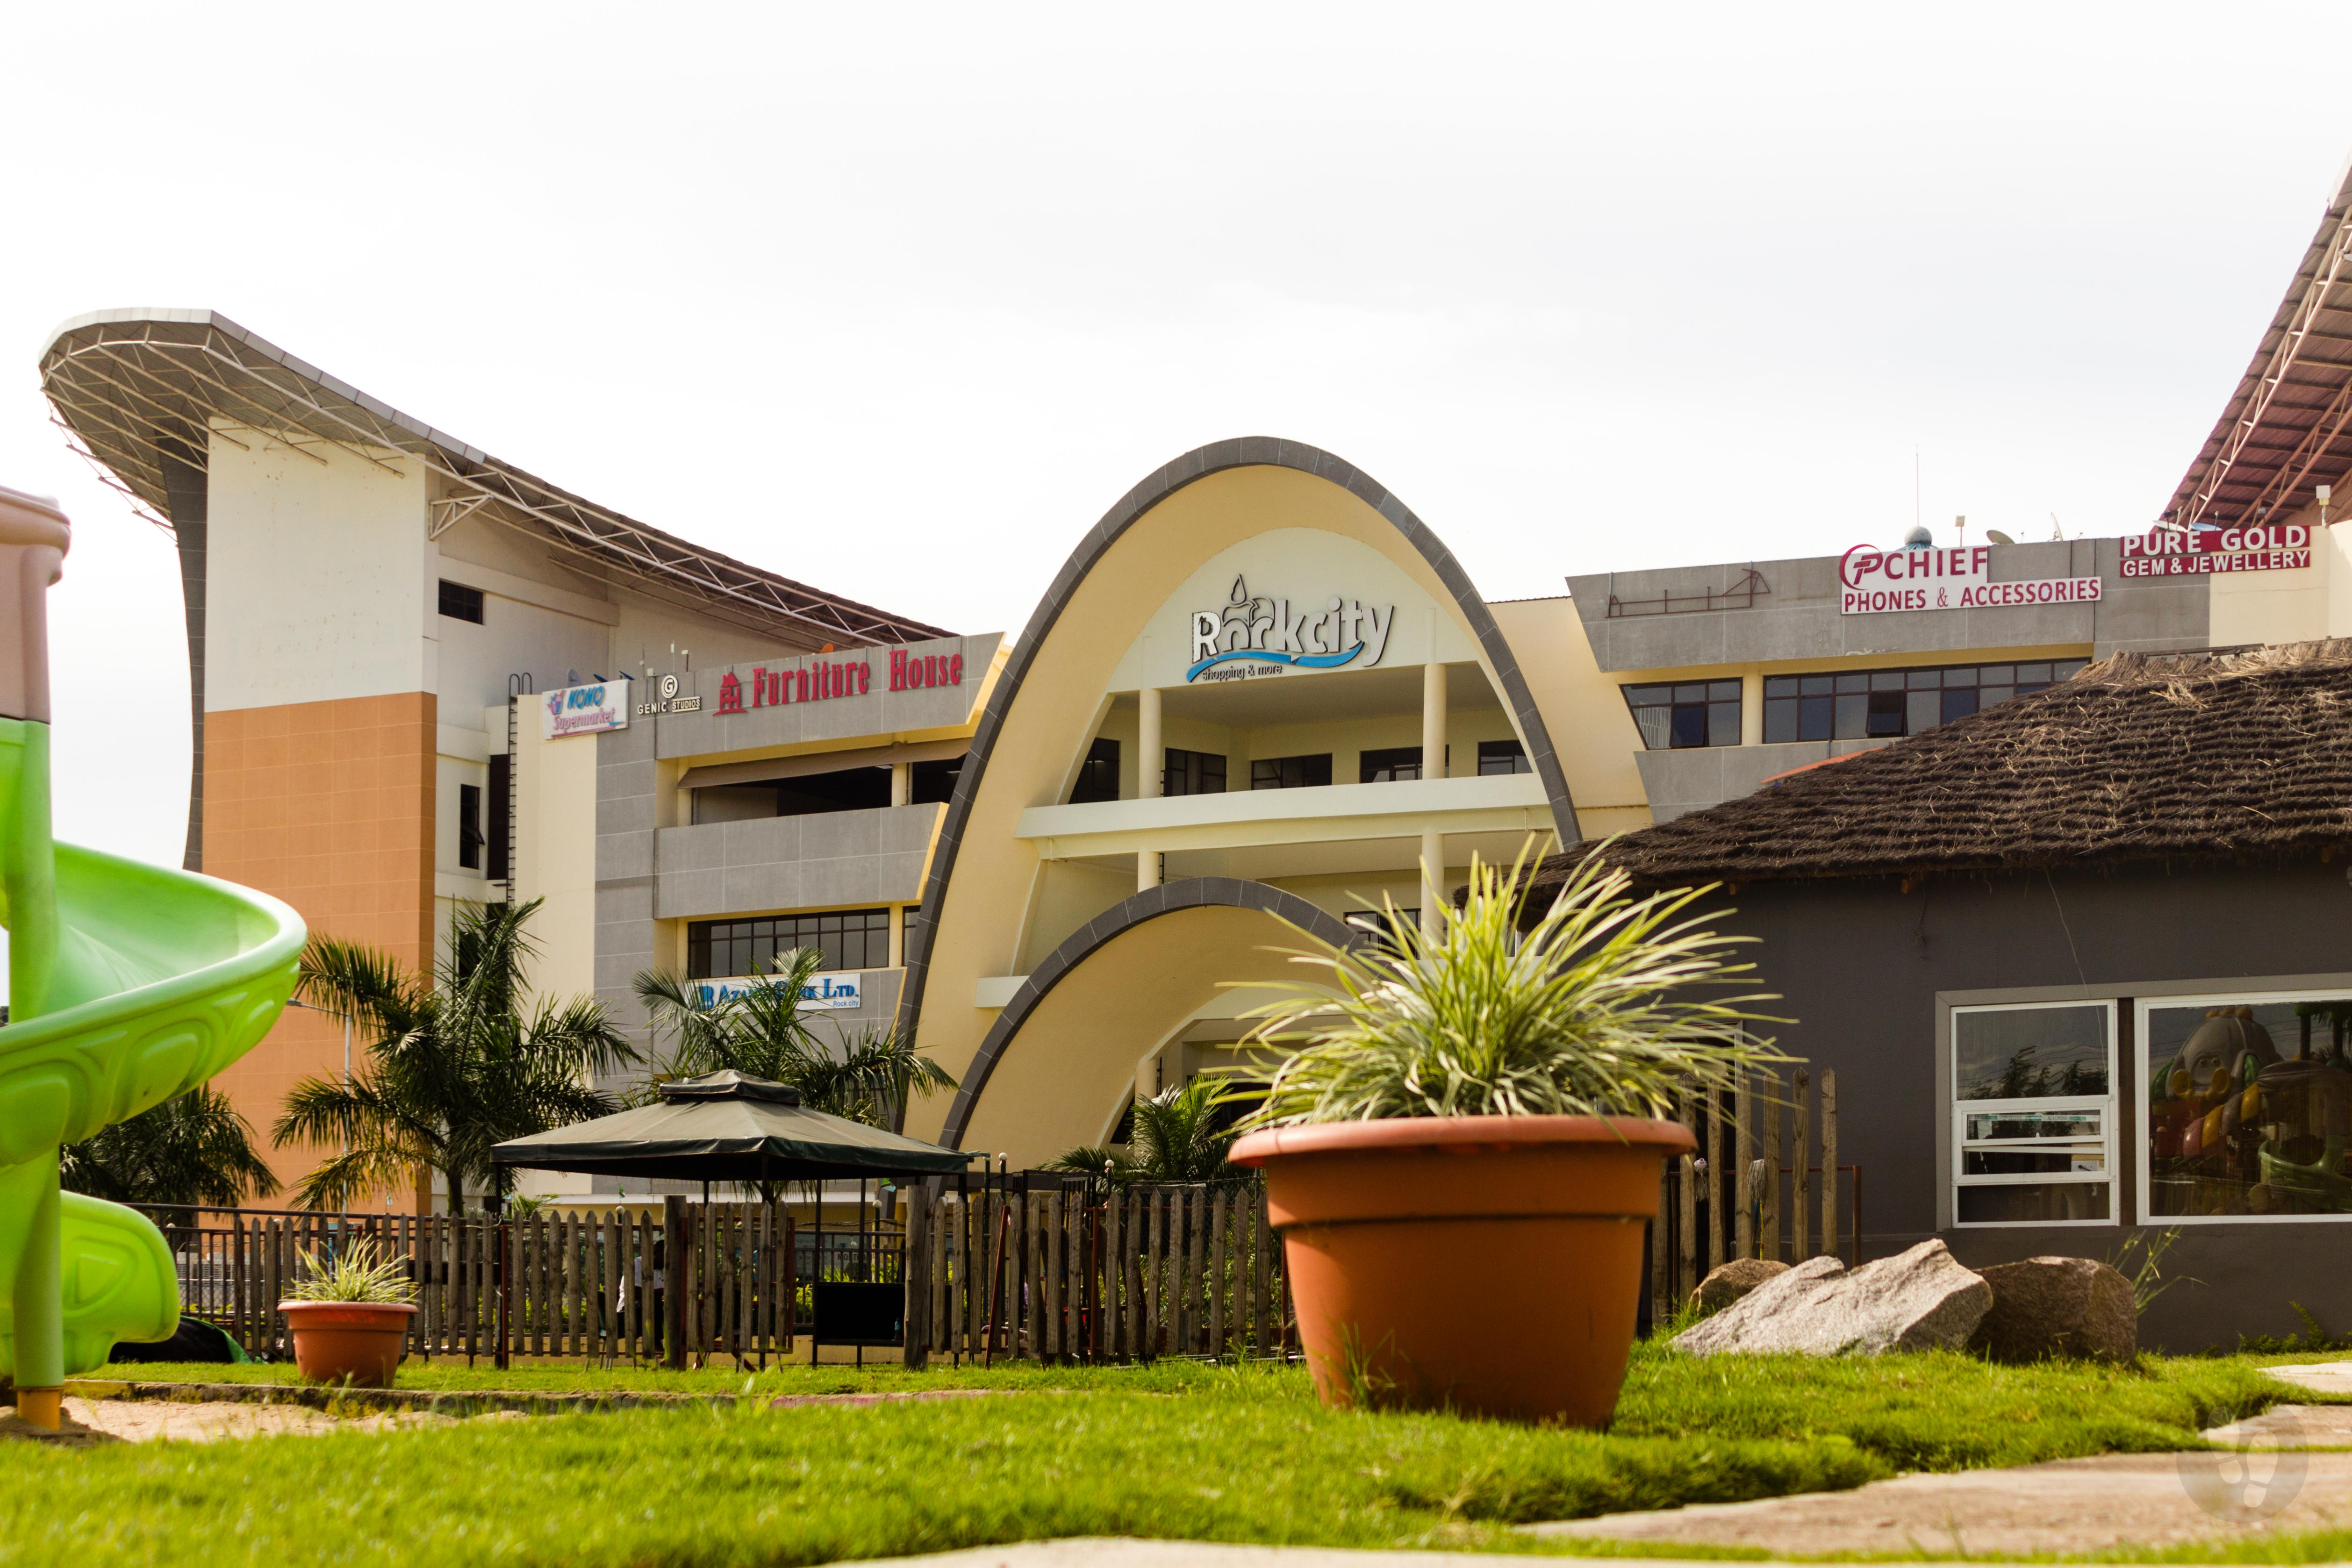 rockcity mall-199.jpg